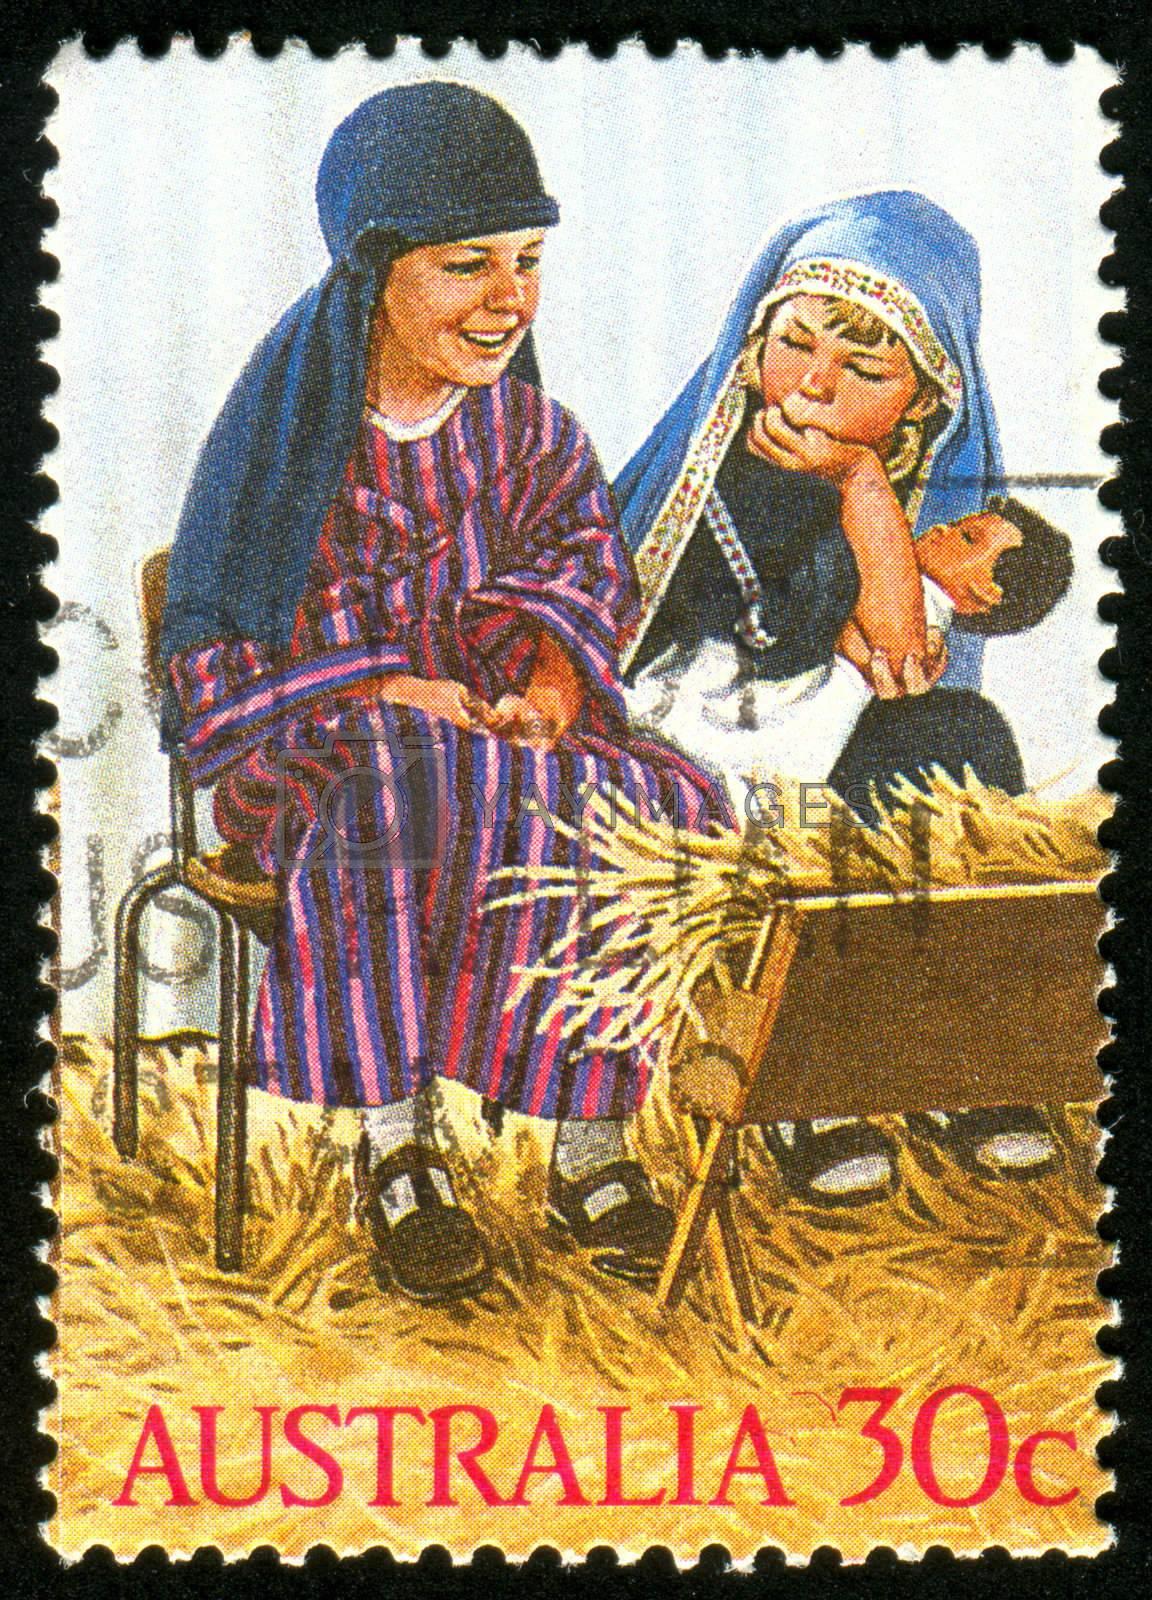 AUSTRALIA - CIRCA 1986: stamp printed by Australia, shows Kindergarten nativity play, circa 1986